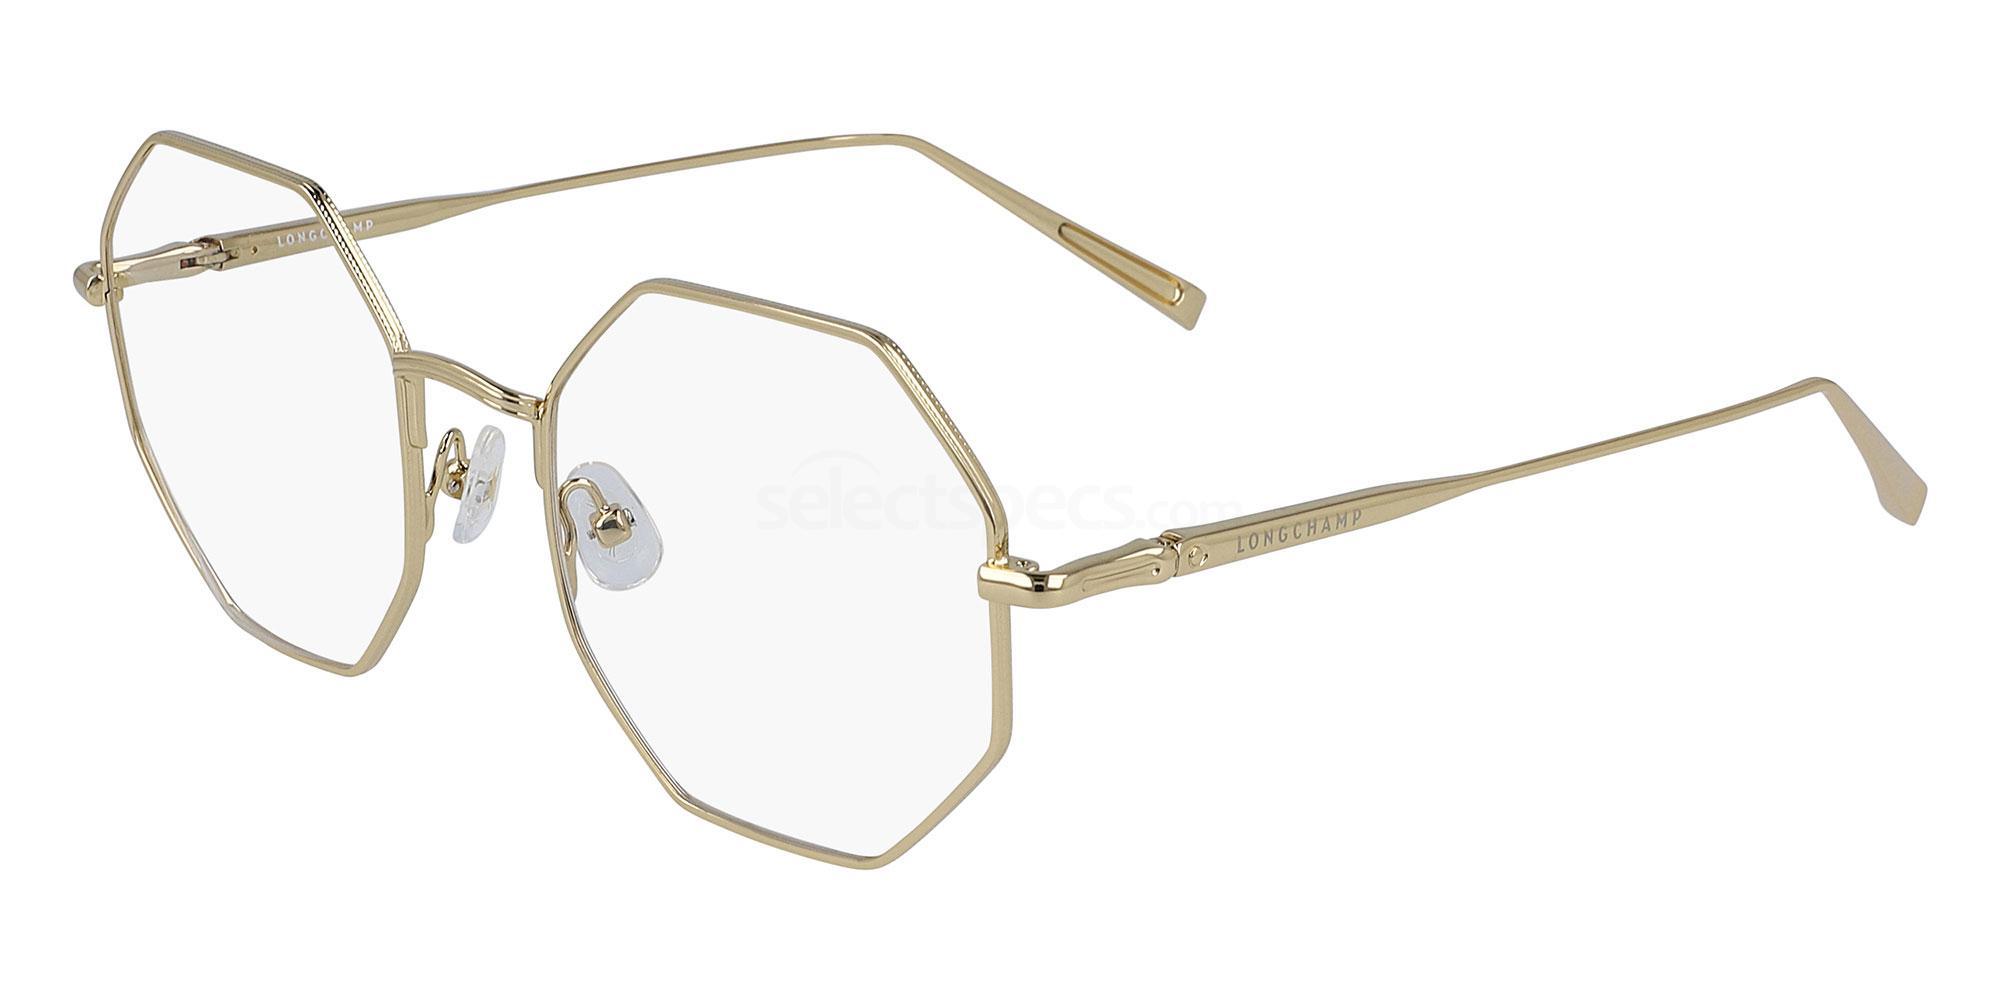 713 LO2113 Glasses, LONGCHAMP